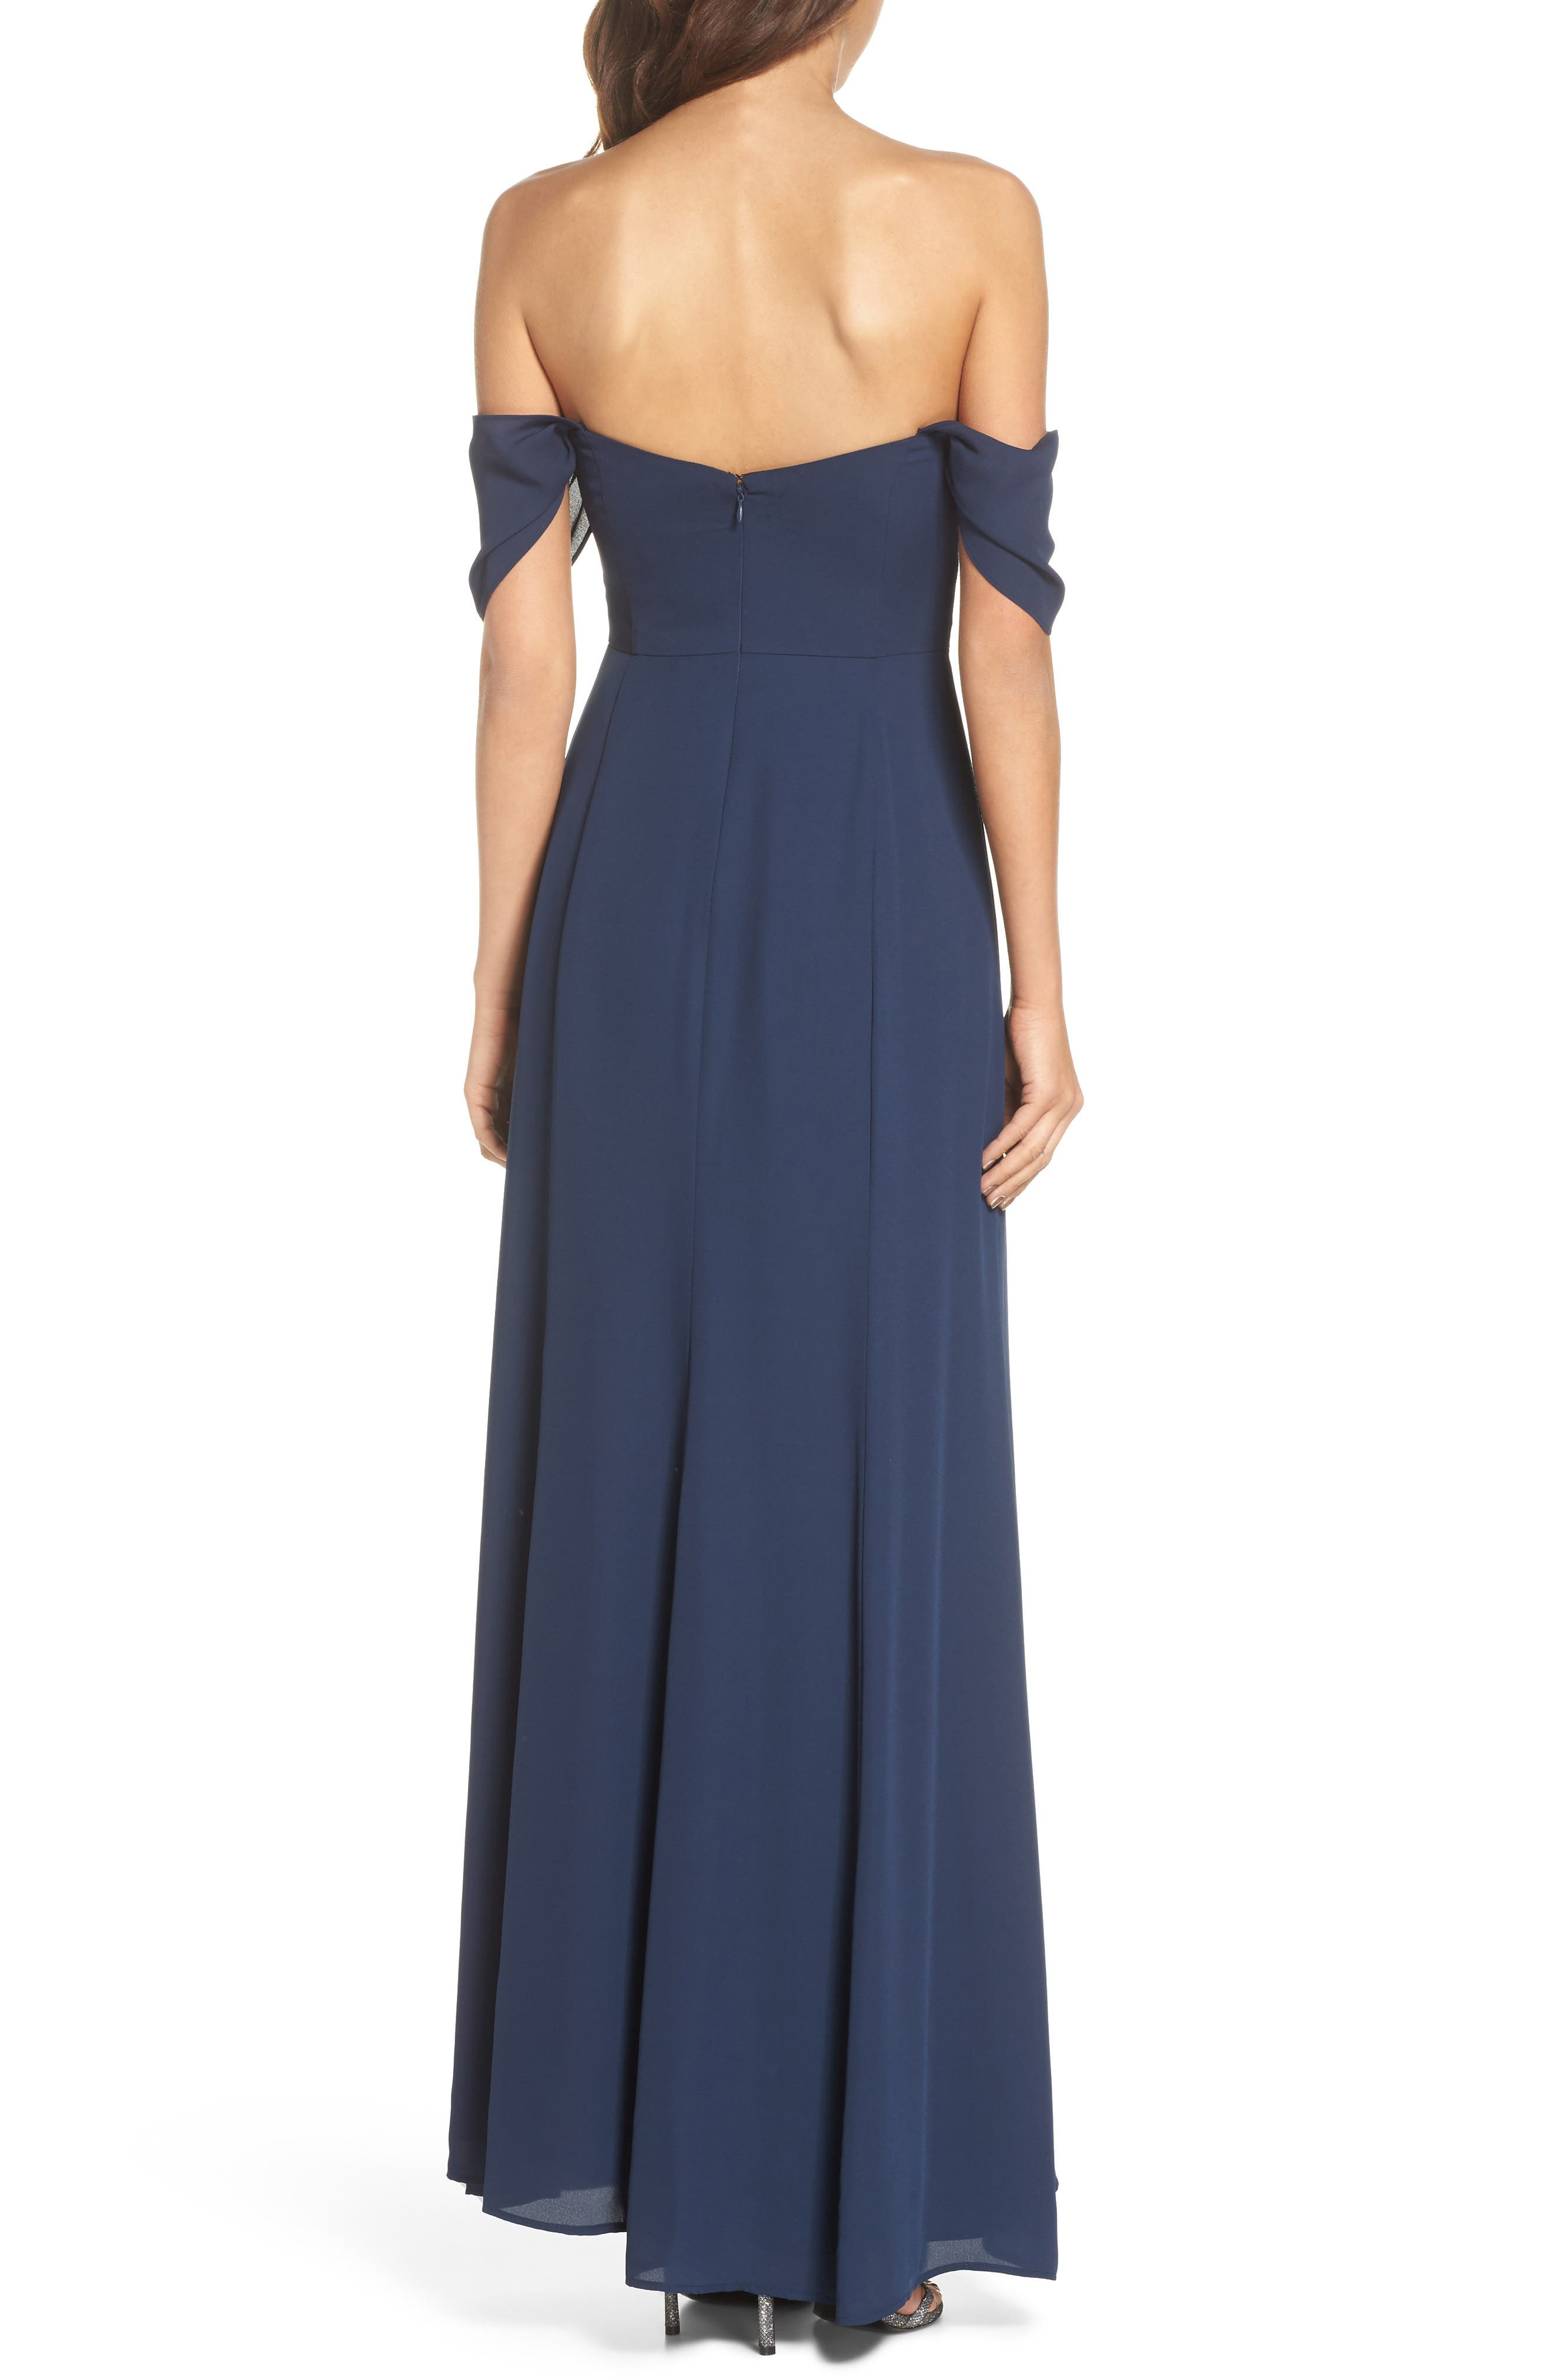 Rachel Off the Shoulder Gored Maxi Dress,                             Alternate thumbnail 3, color,